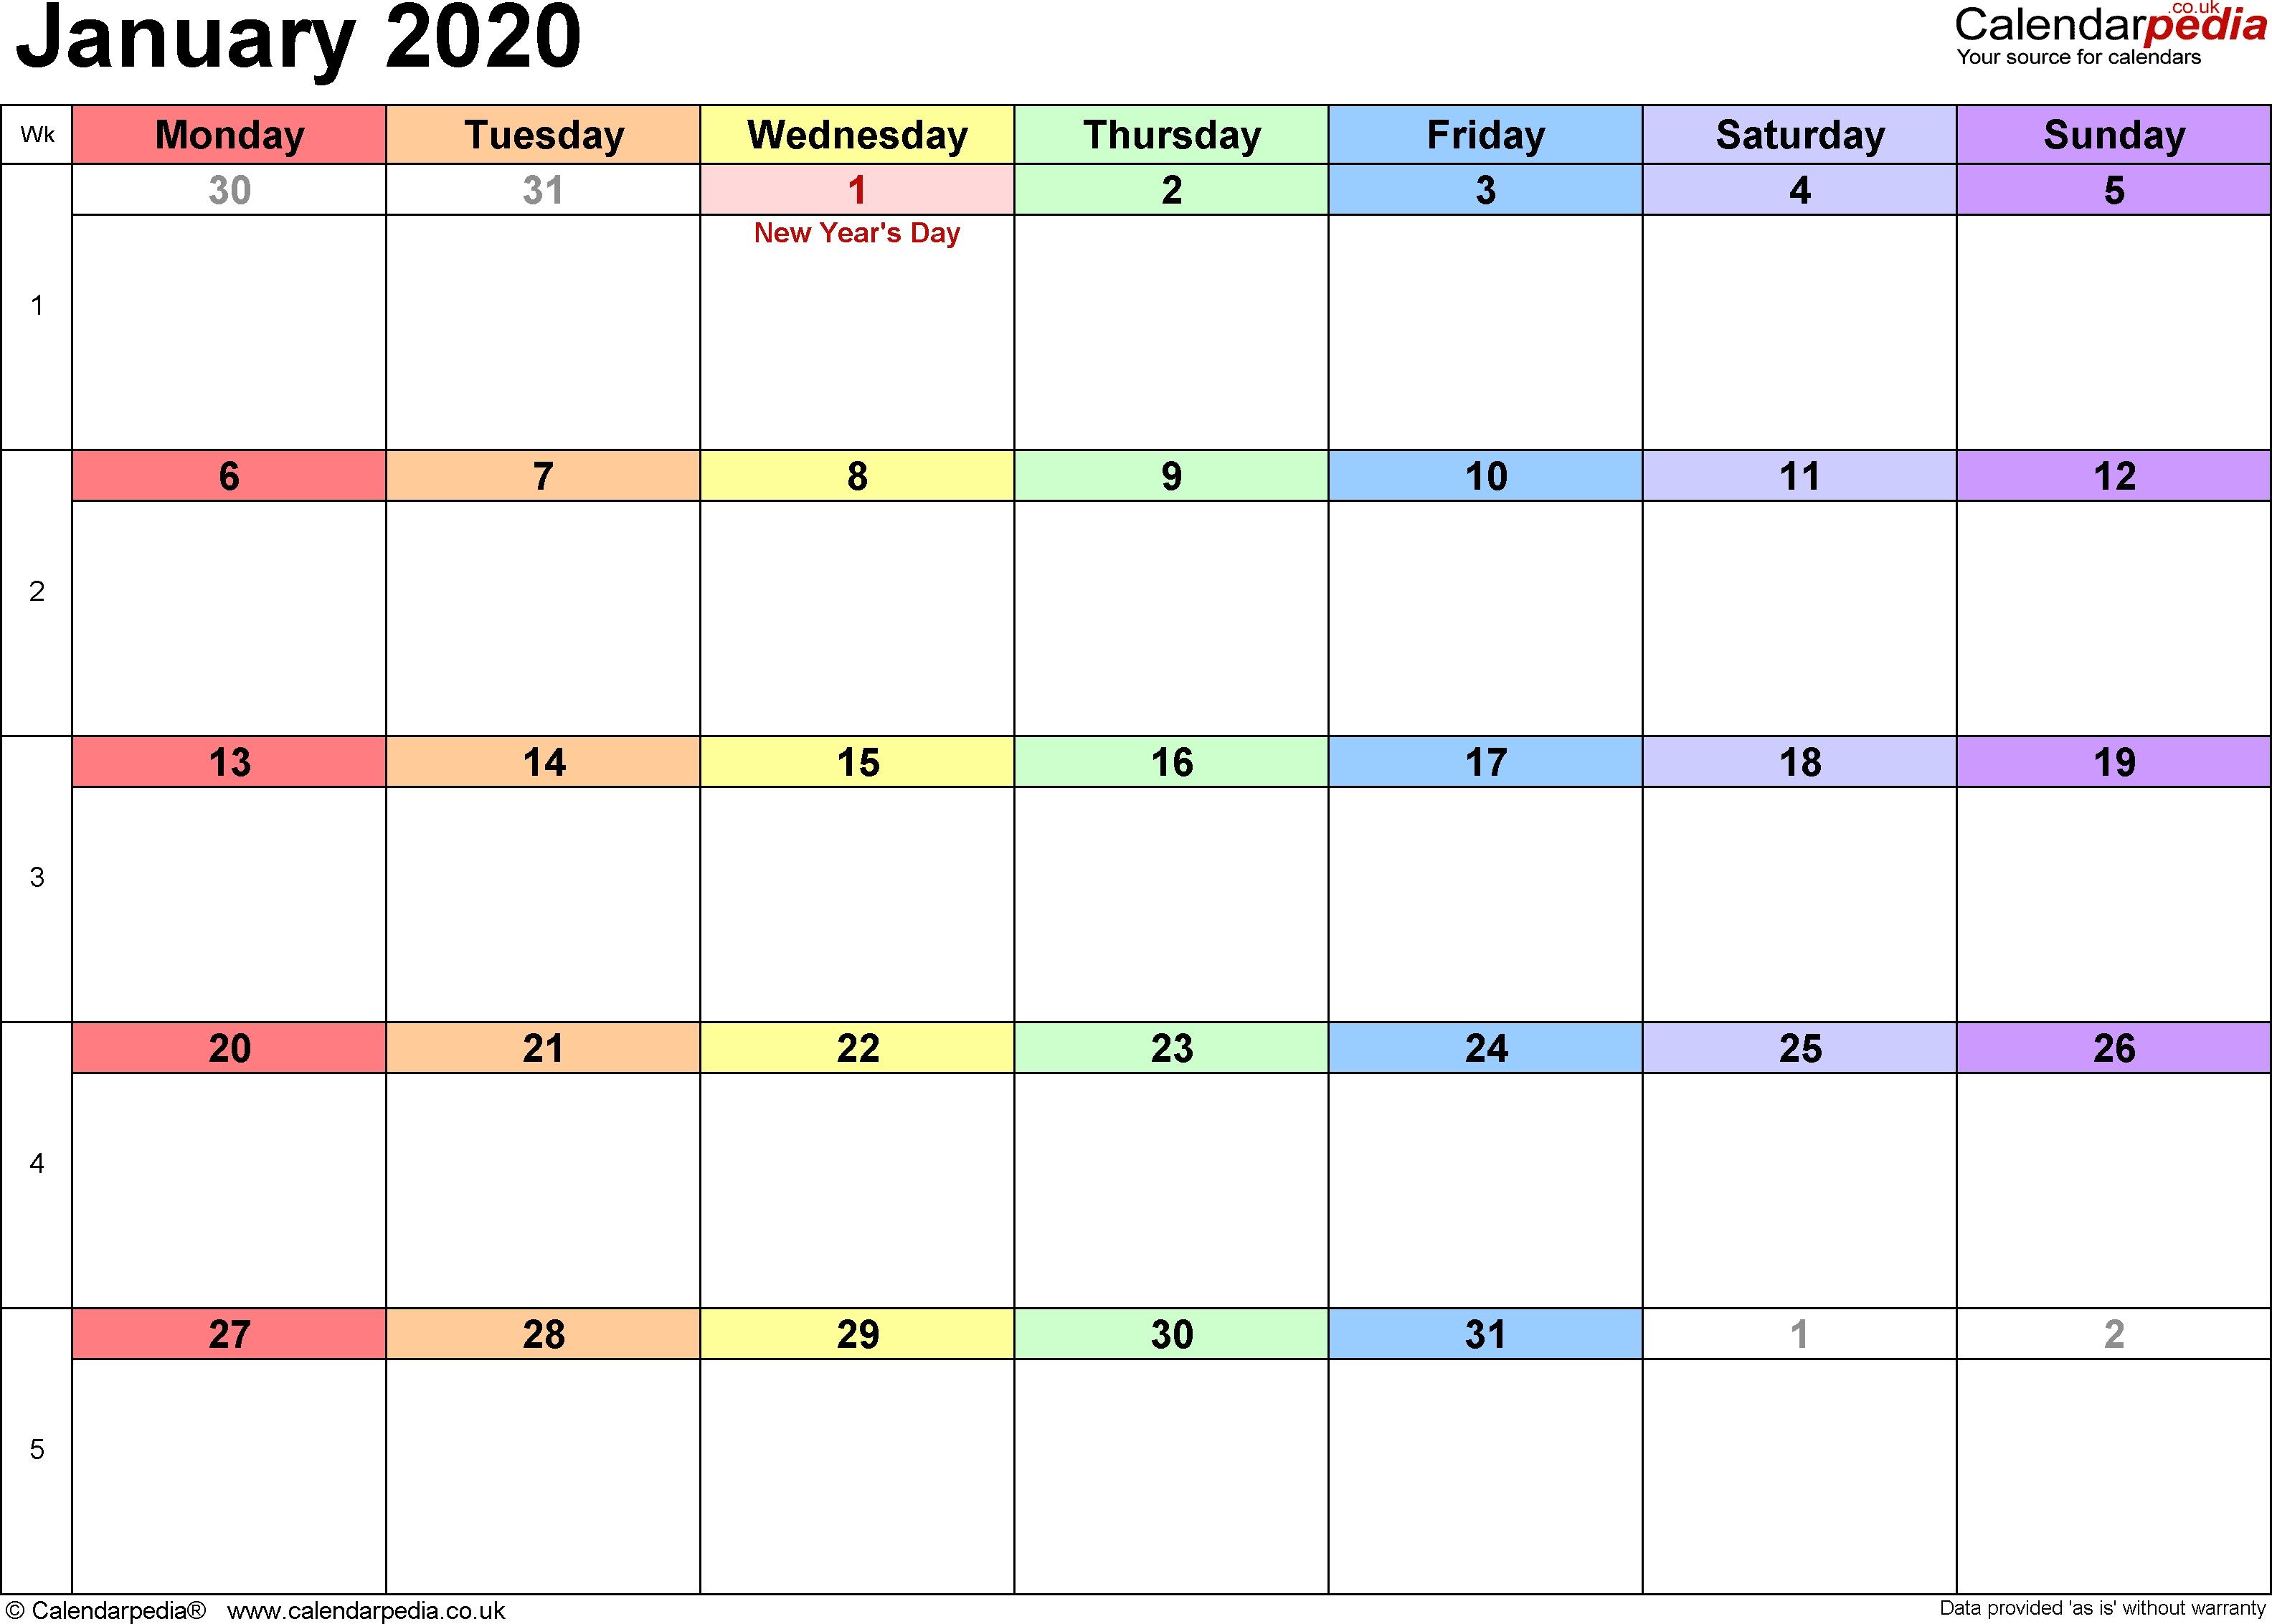 Calendar January 2020 Uk, Bank Holidays, Excel/pdf/word-January 2020 Daily Calendar